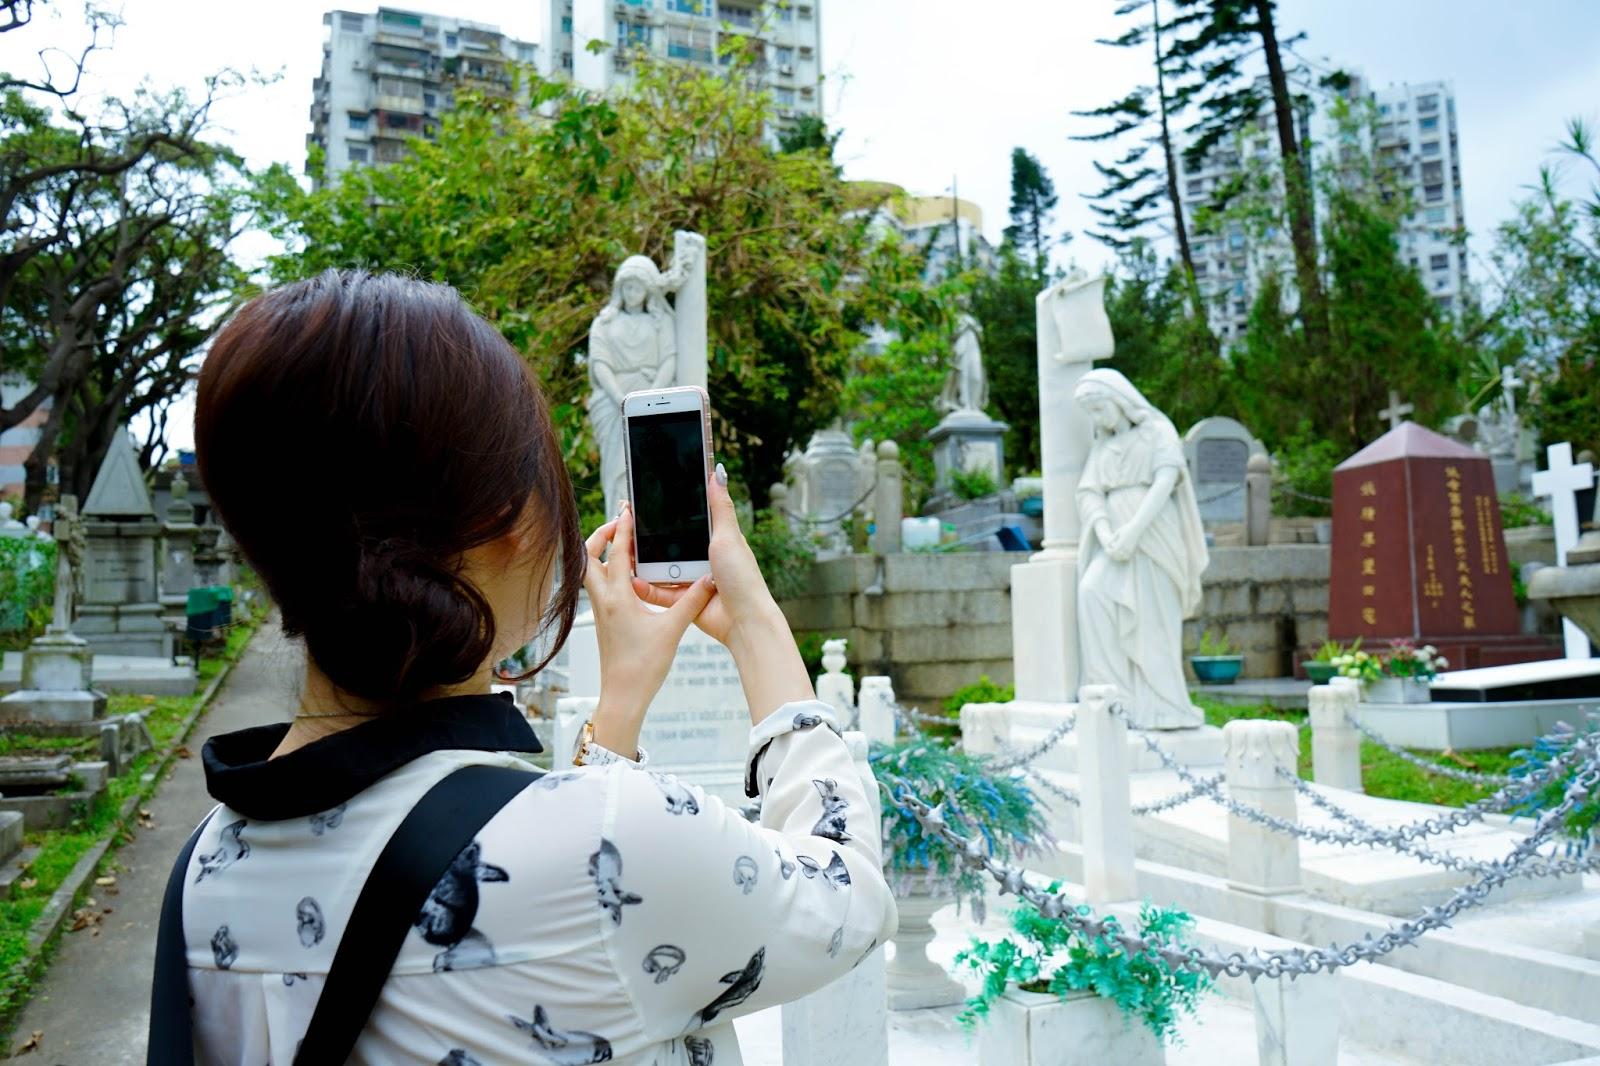 beautyanxiety.com-St. Michael's Chapel and Cemetery-beautyanxiety.com-St.%2BMichael%2527s%2BChapel%2Band%2BCemetery-DSC09869.jpg